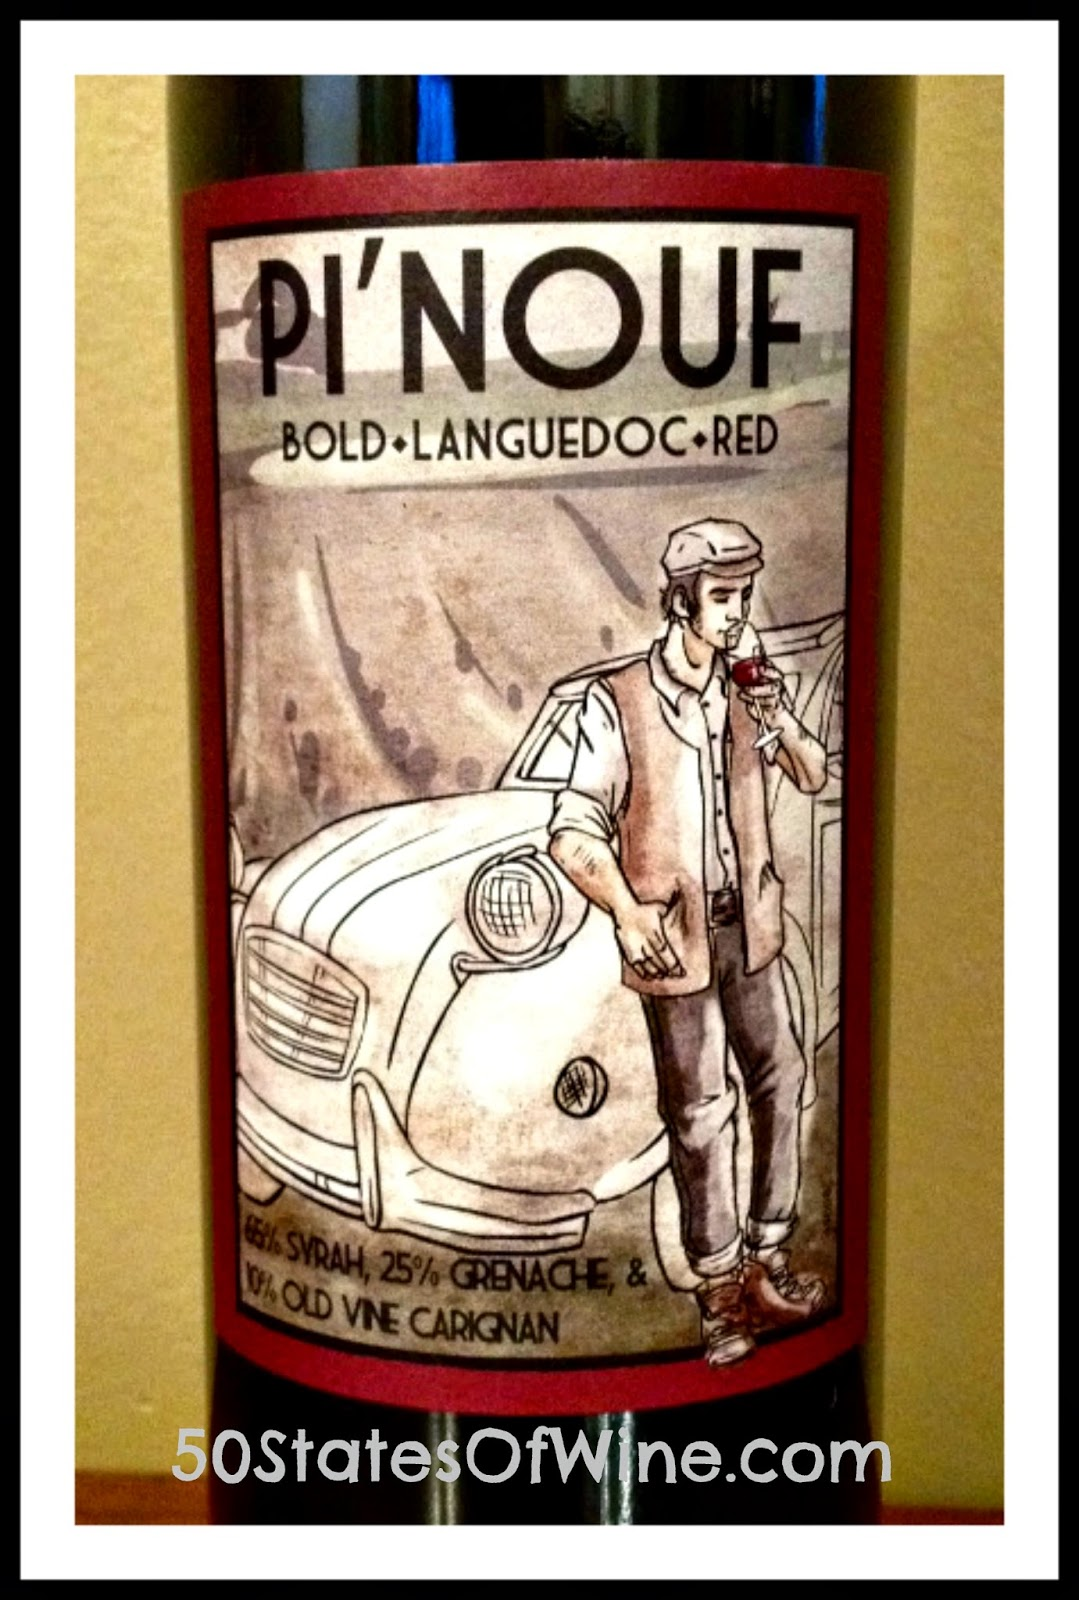 Pi'nouf 2009 Languedoc Red